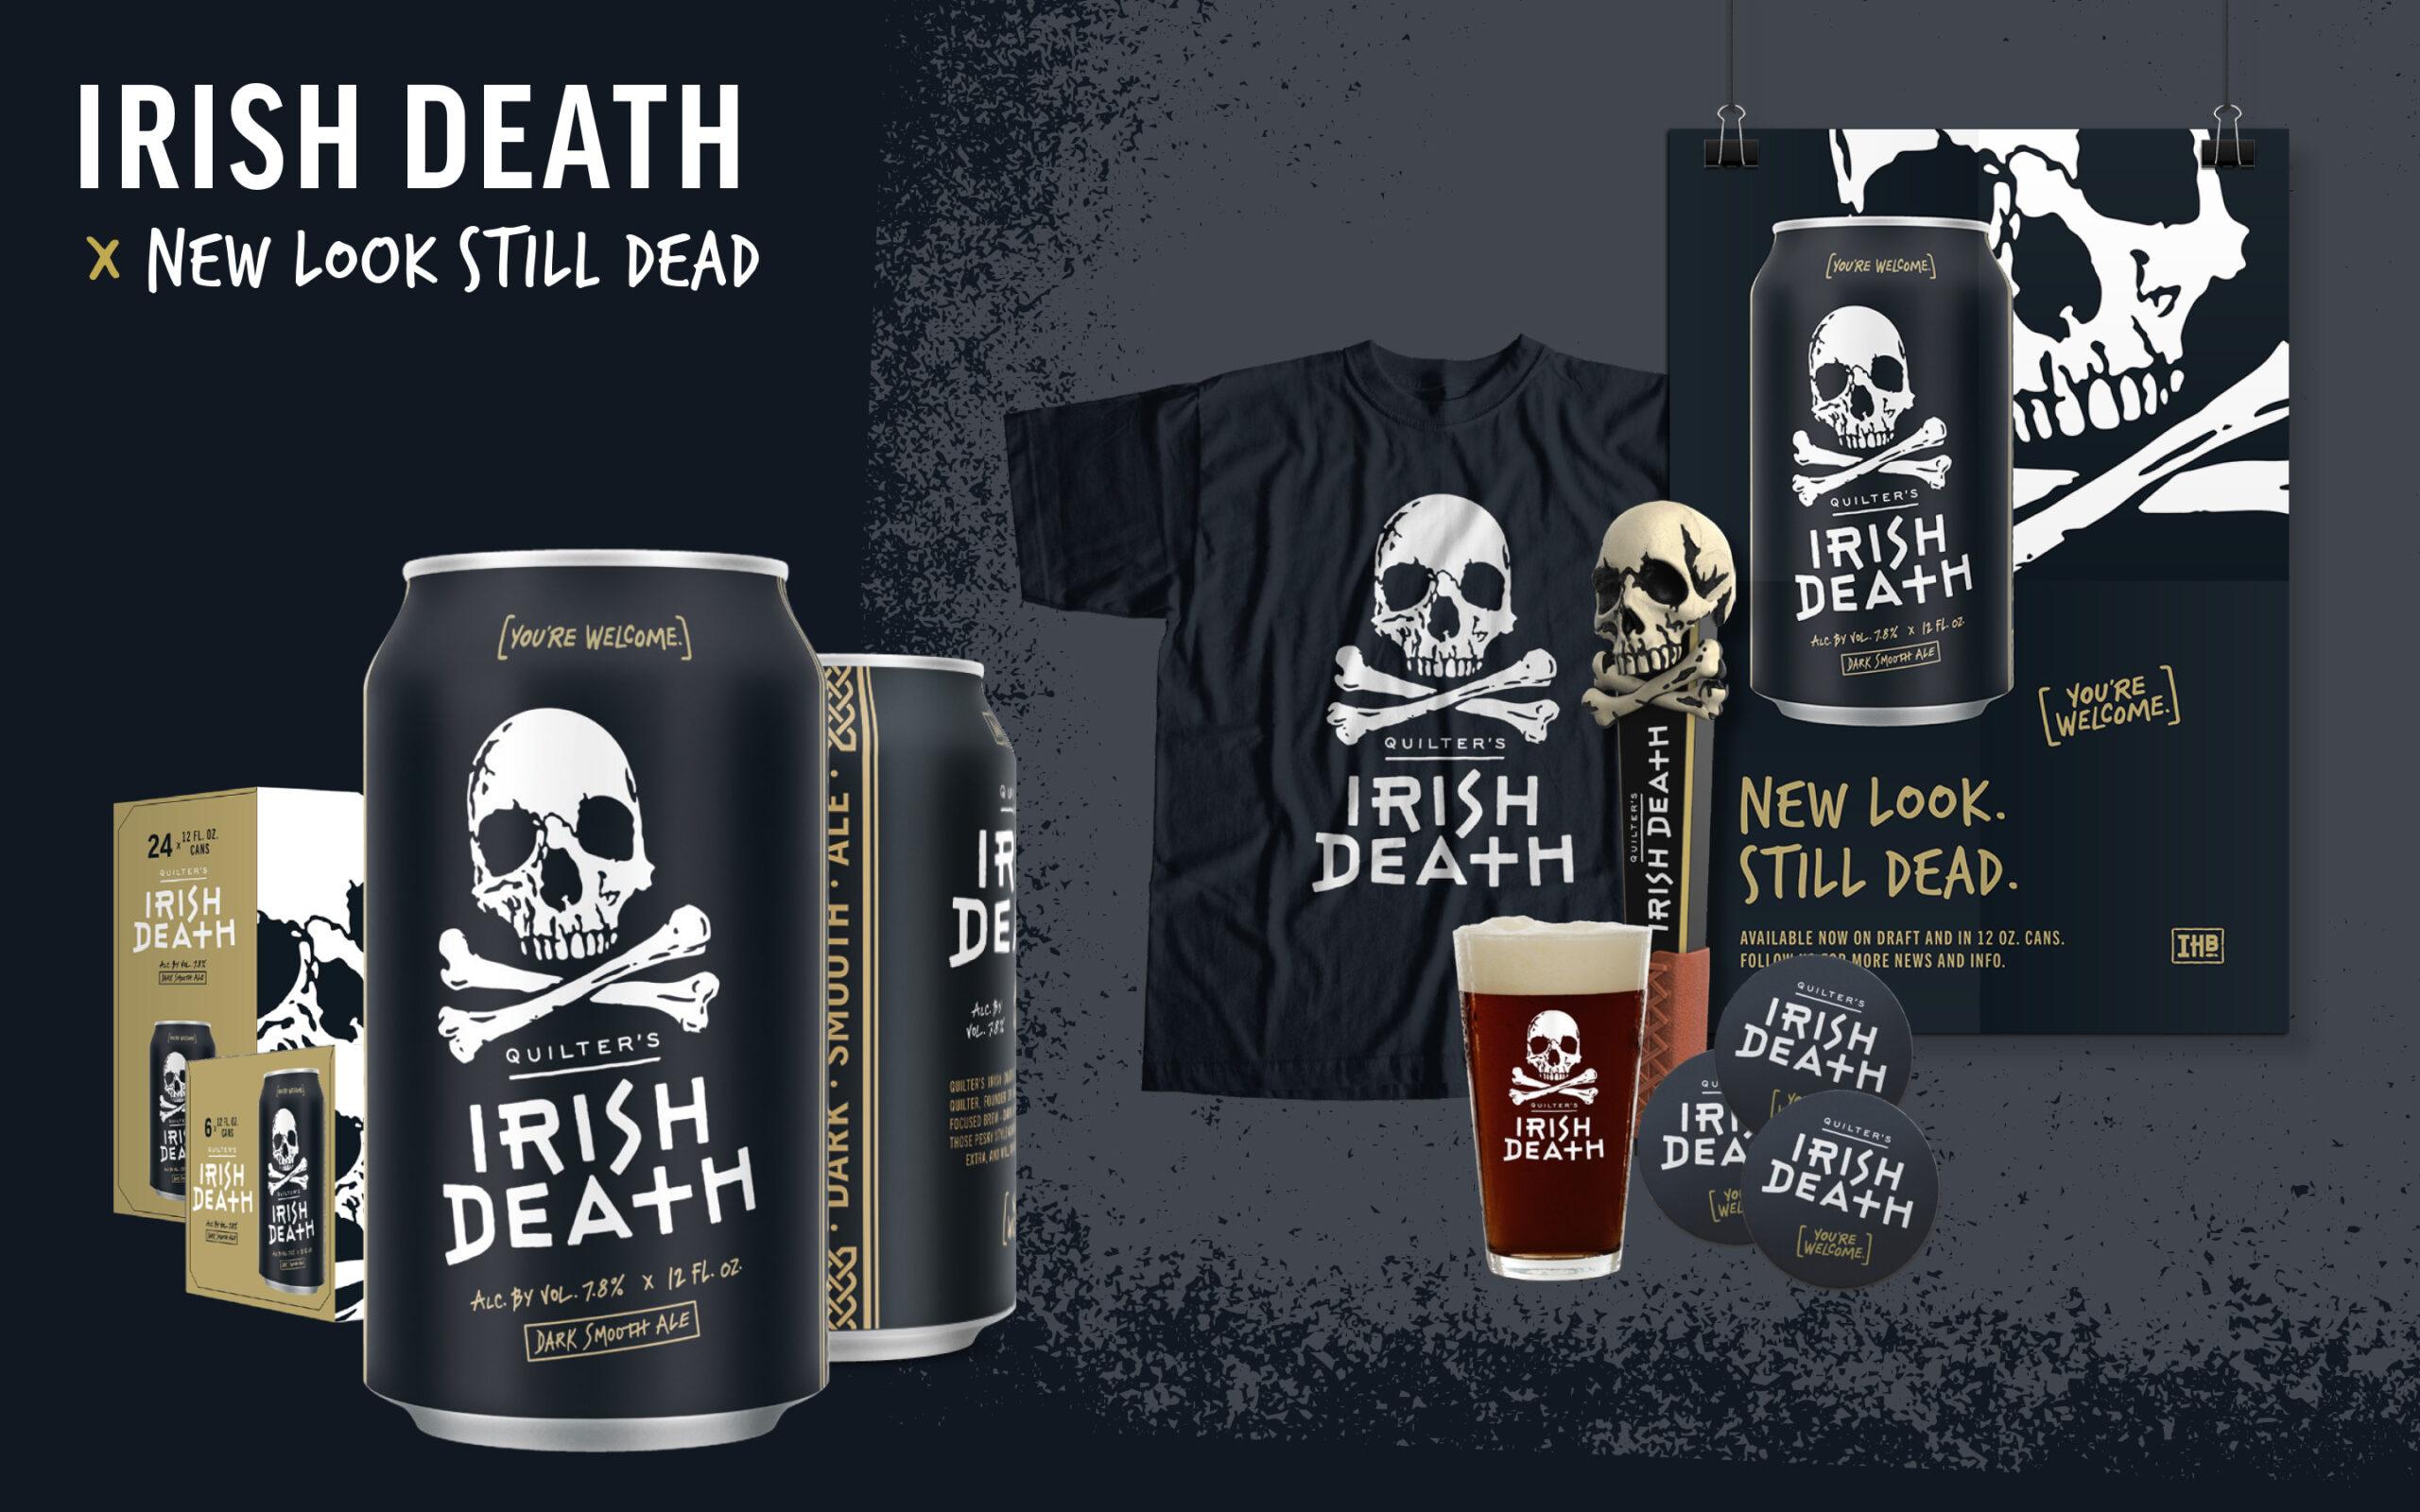 Irish death rebranded look